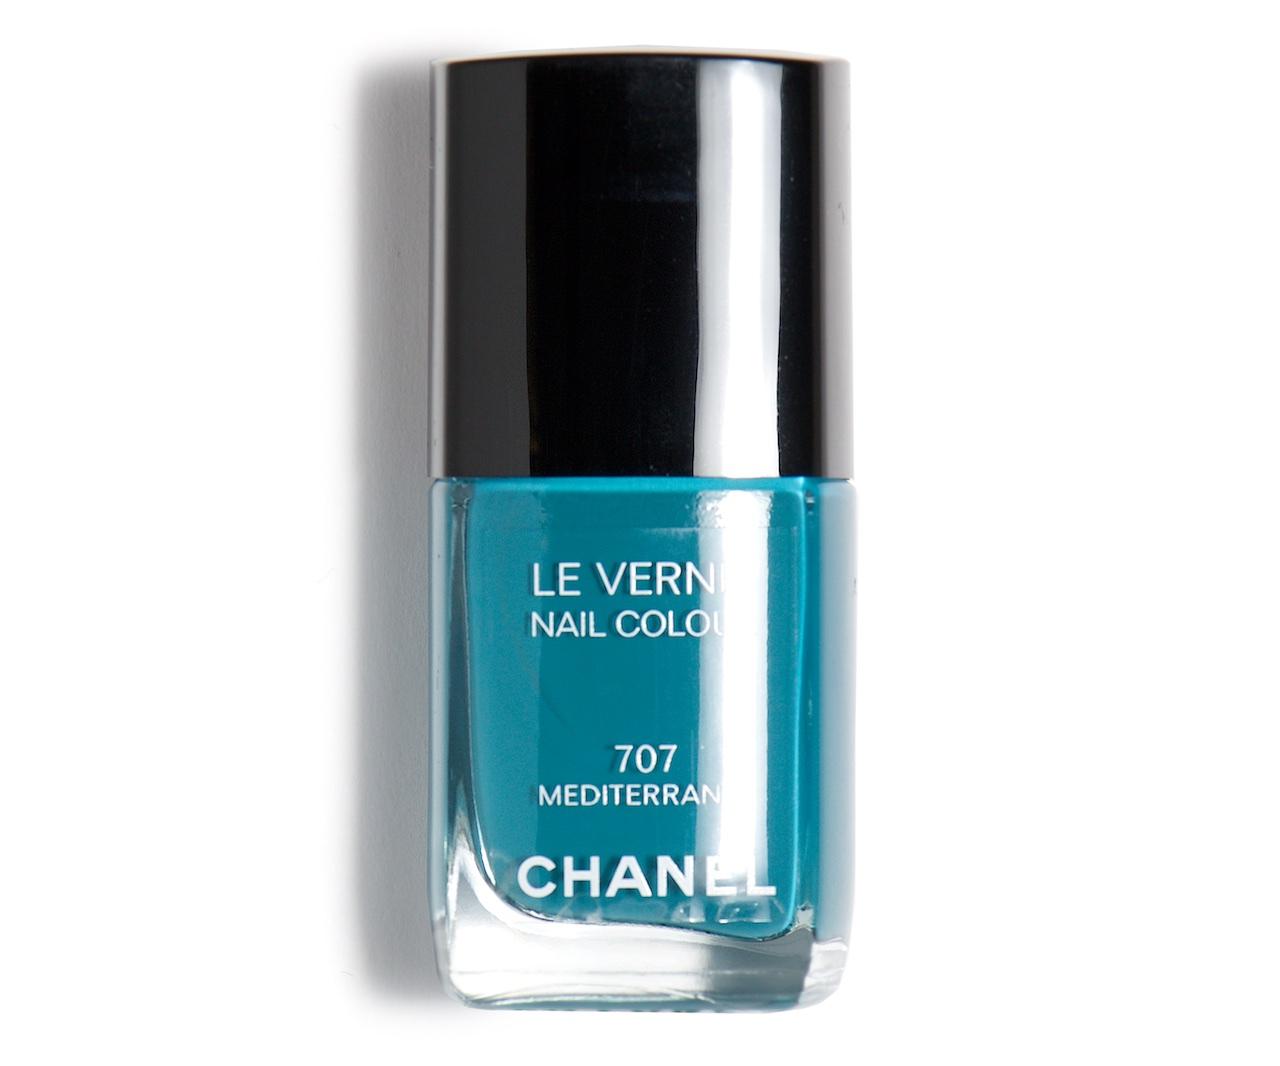 Chanel Le Vernis in 707 Mediterranee